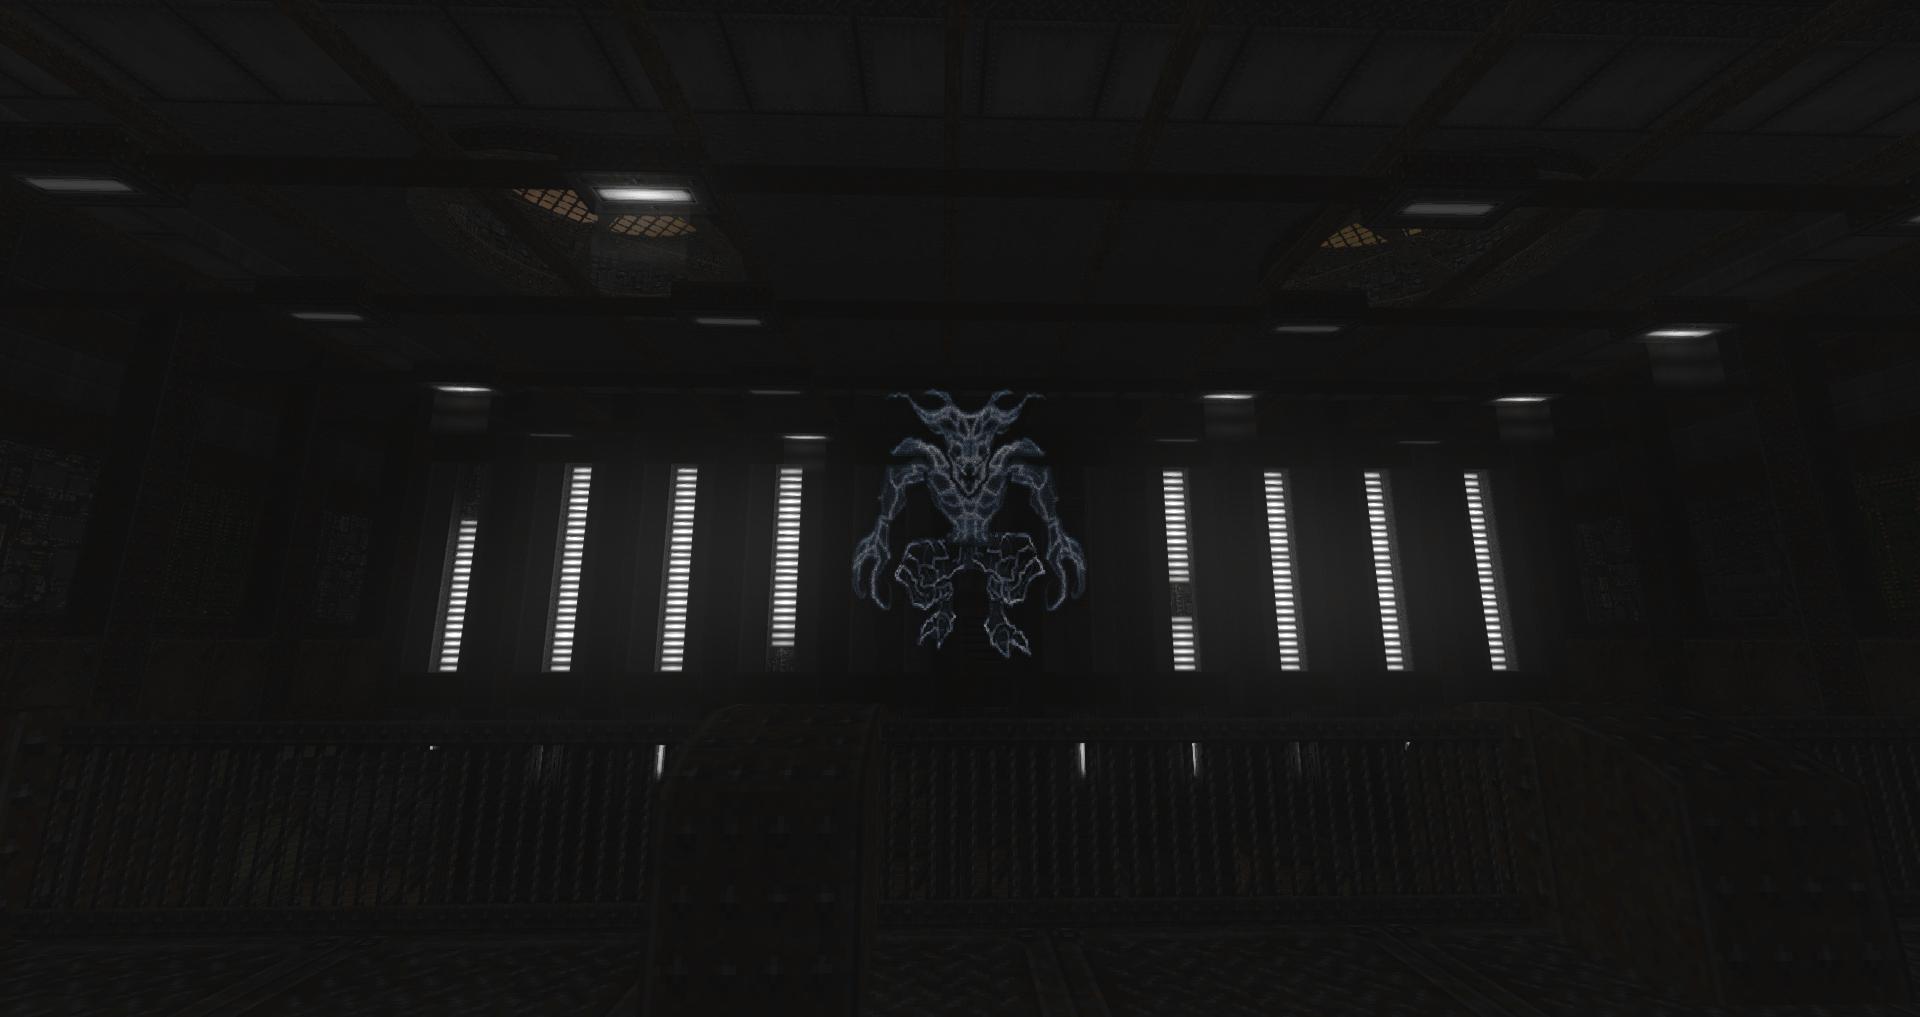 Screenshot_Doom_20200728_100957.png.4e397d4d8b107977611270a2324b8c8b.png